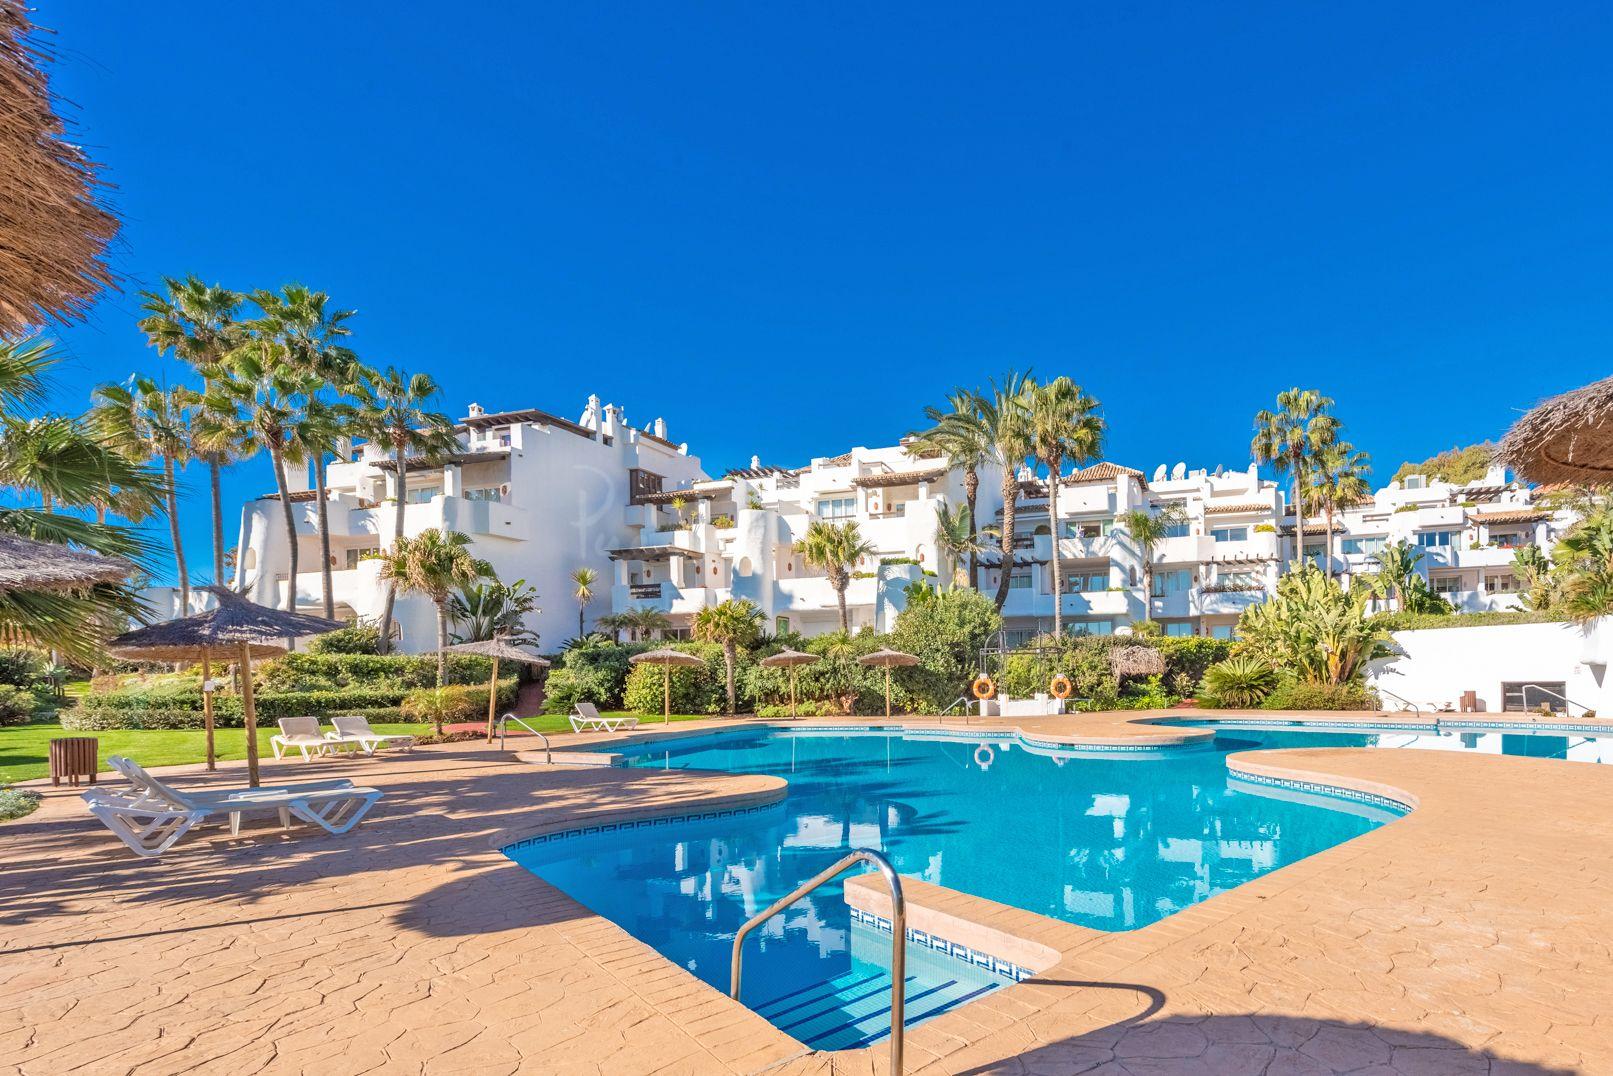 Duplex Penthouse in Ventura del Mar, Marbella